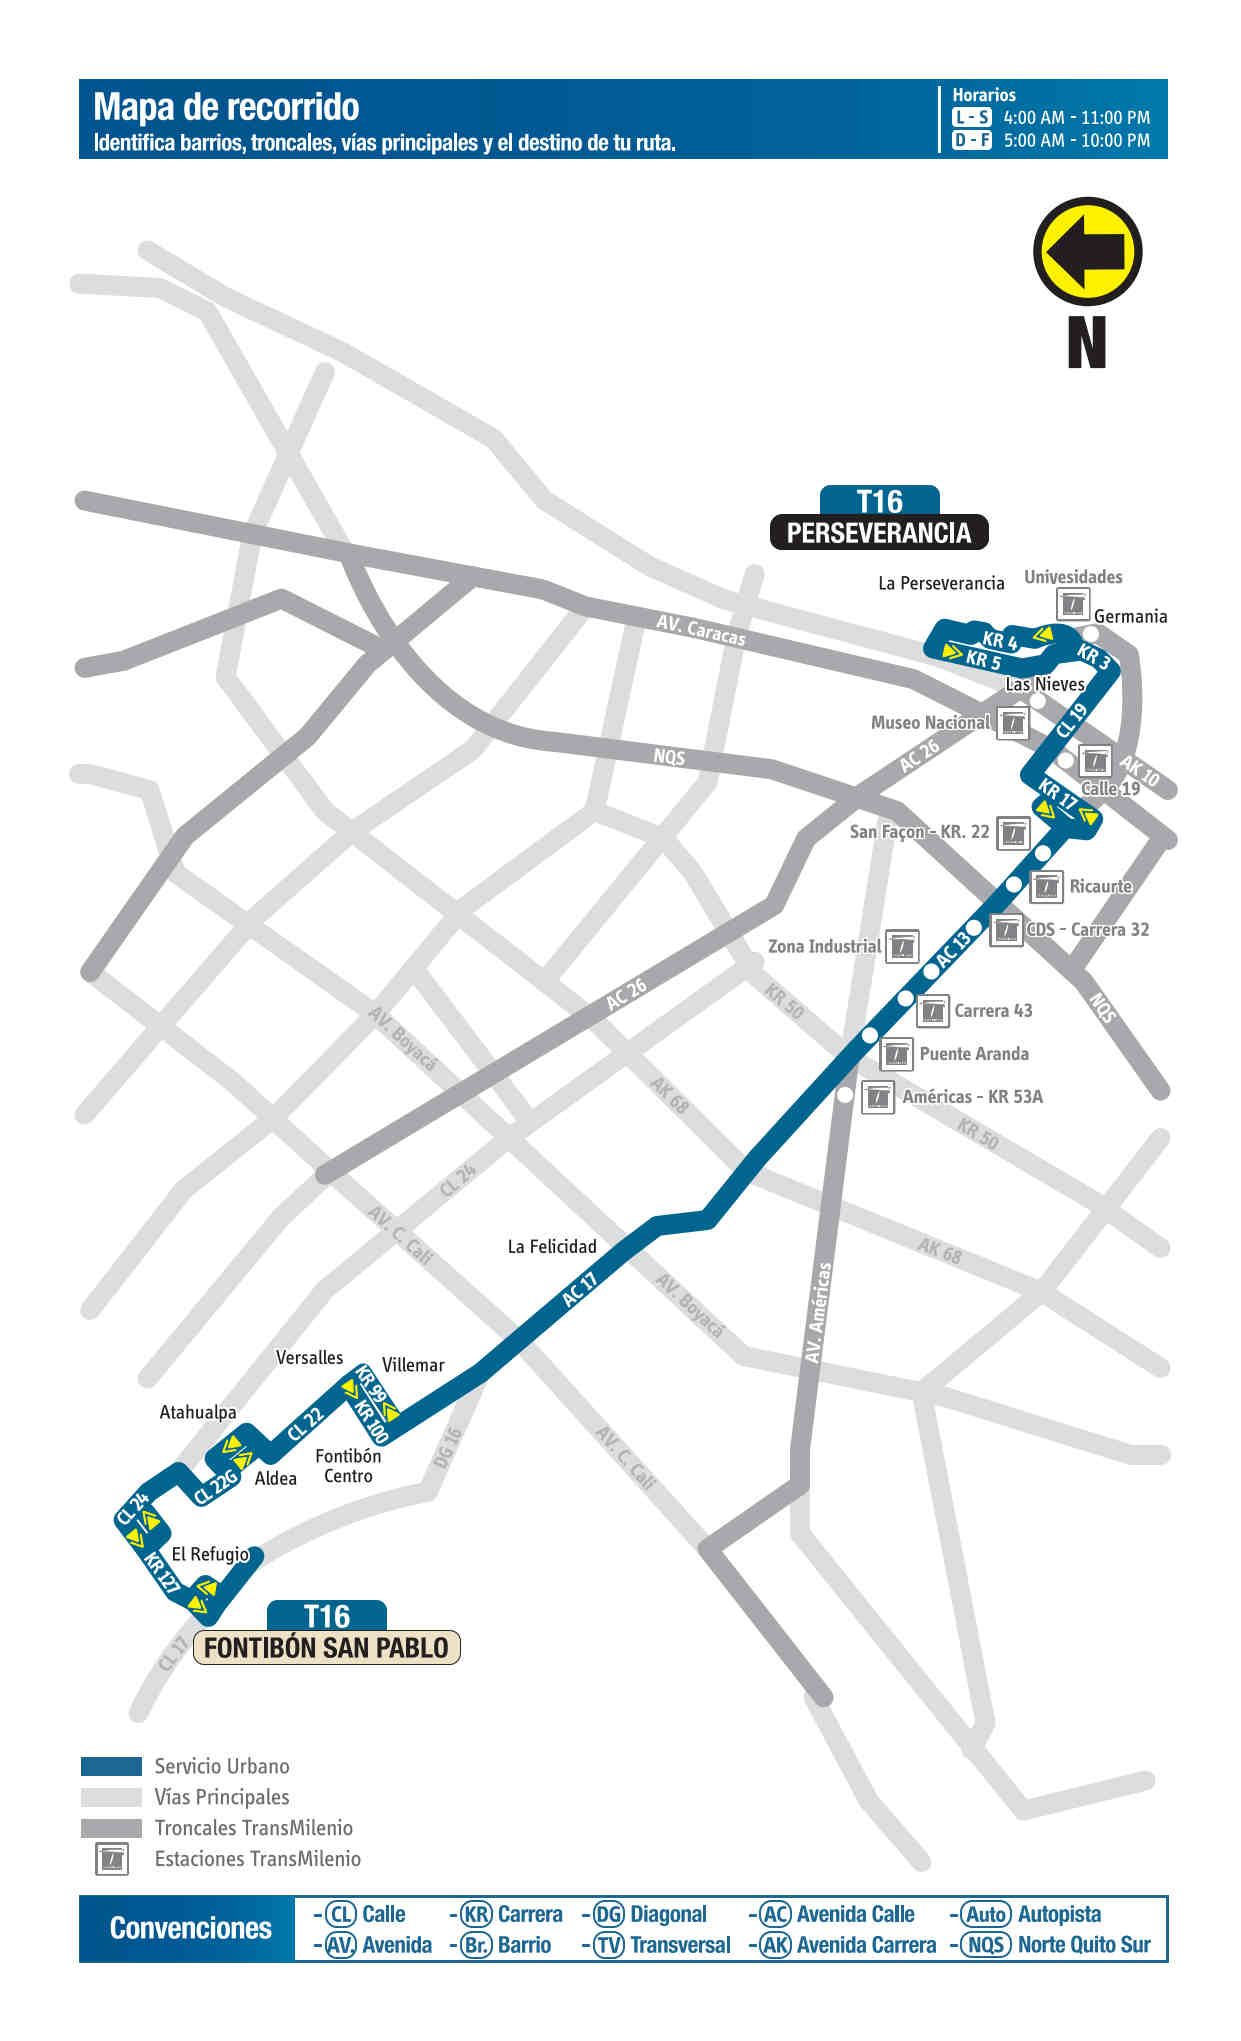 T16 Fontibón San Pablo - La Perseverancia, mapa bus urbano Bogotá